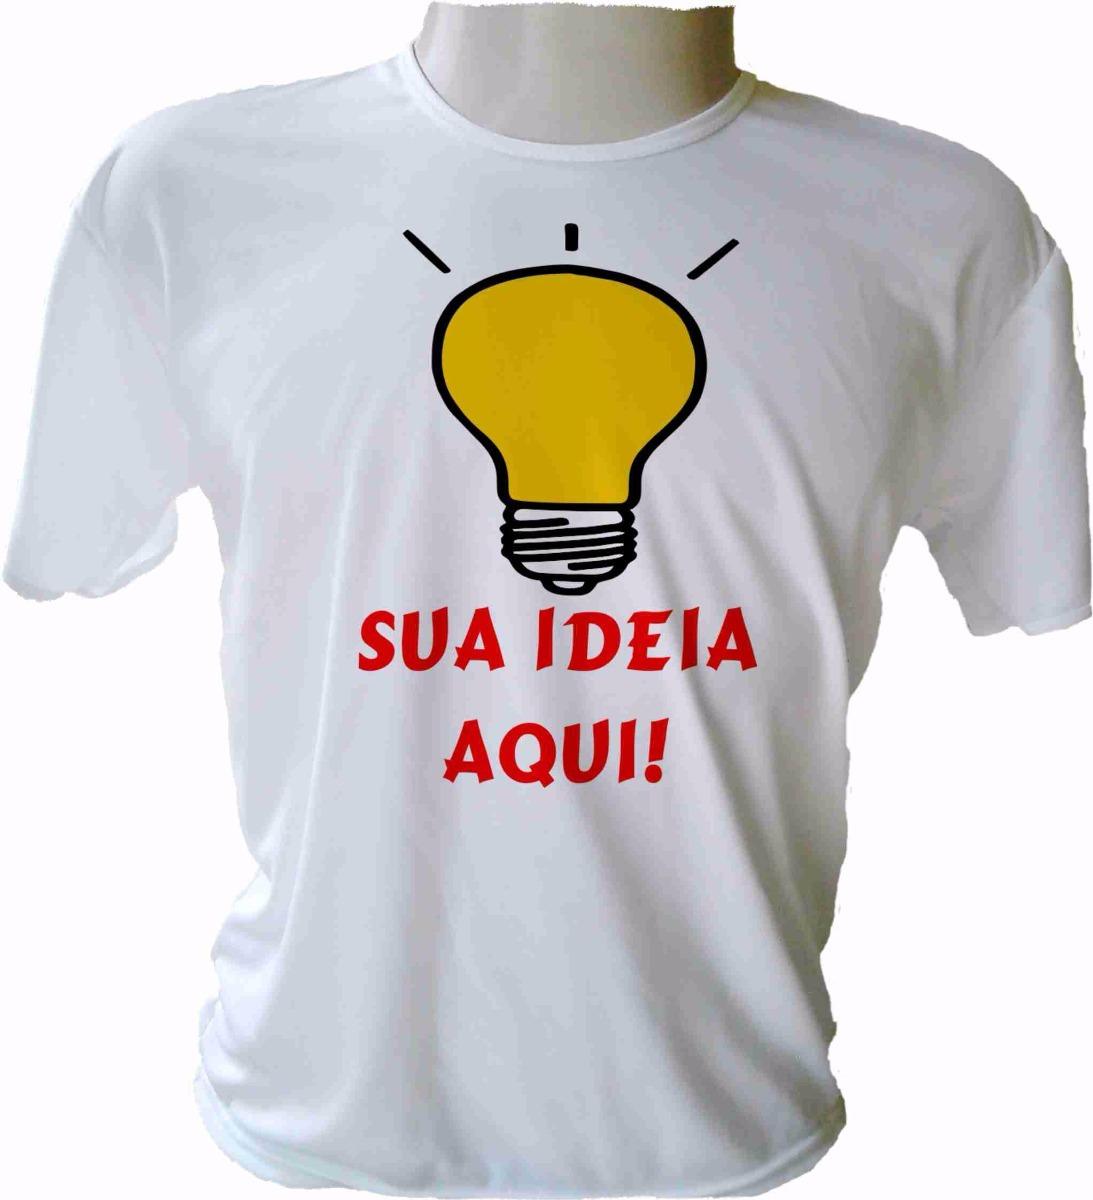 fb5c47441 Camisetas Personalizadas Abadá Festa C  Sua Estampa Kit 10un - R  185